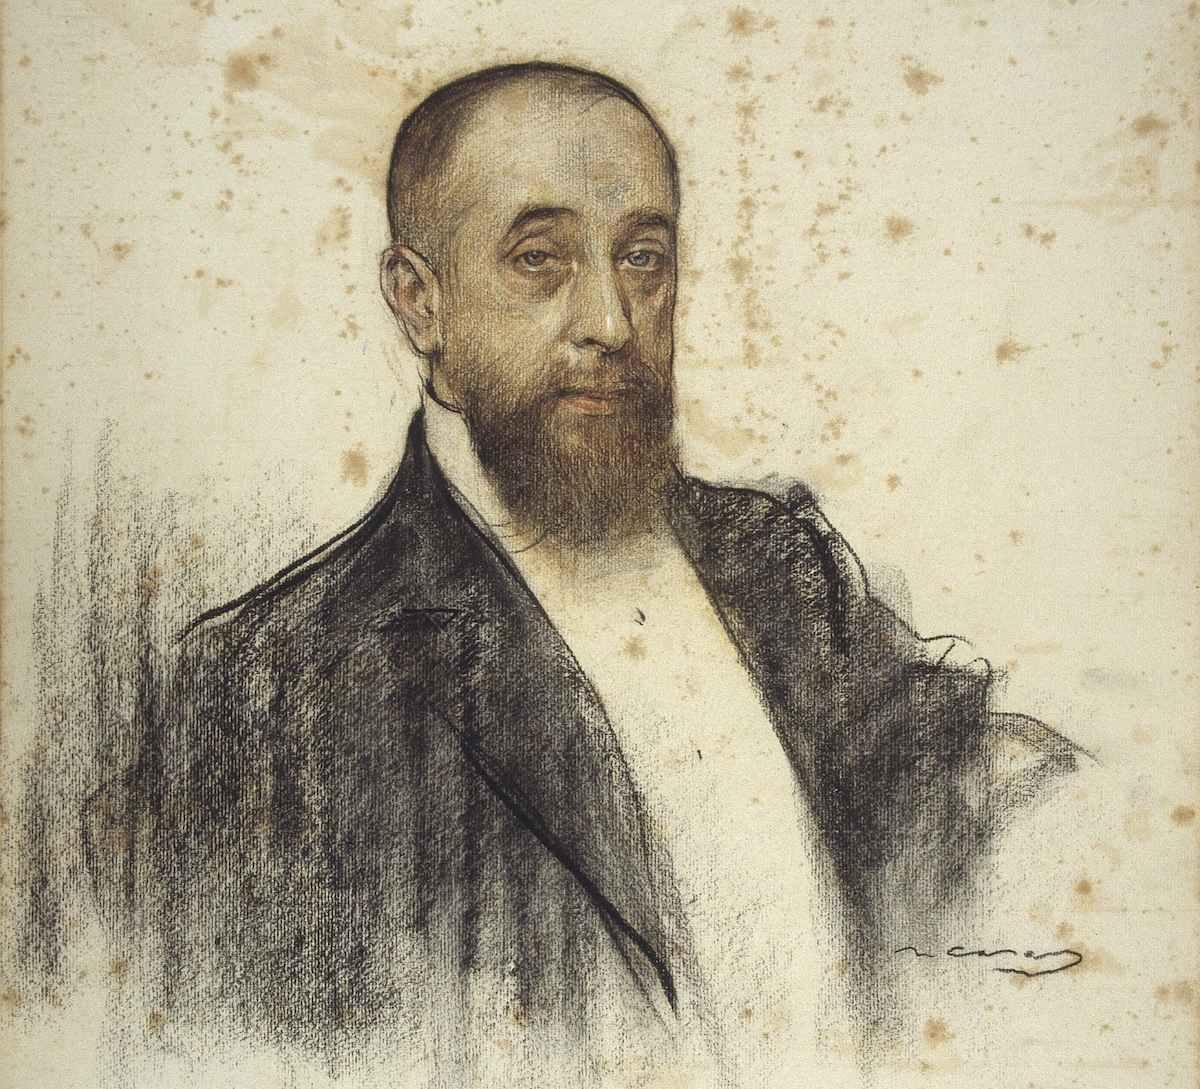 Frederic Rahola